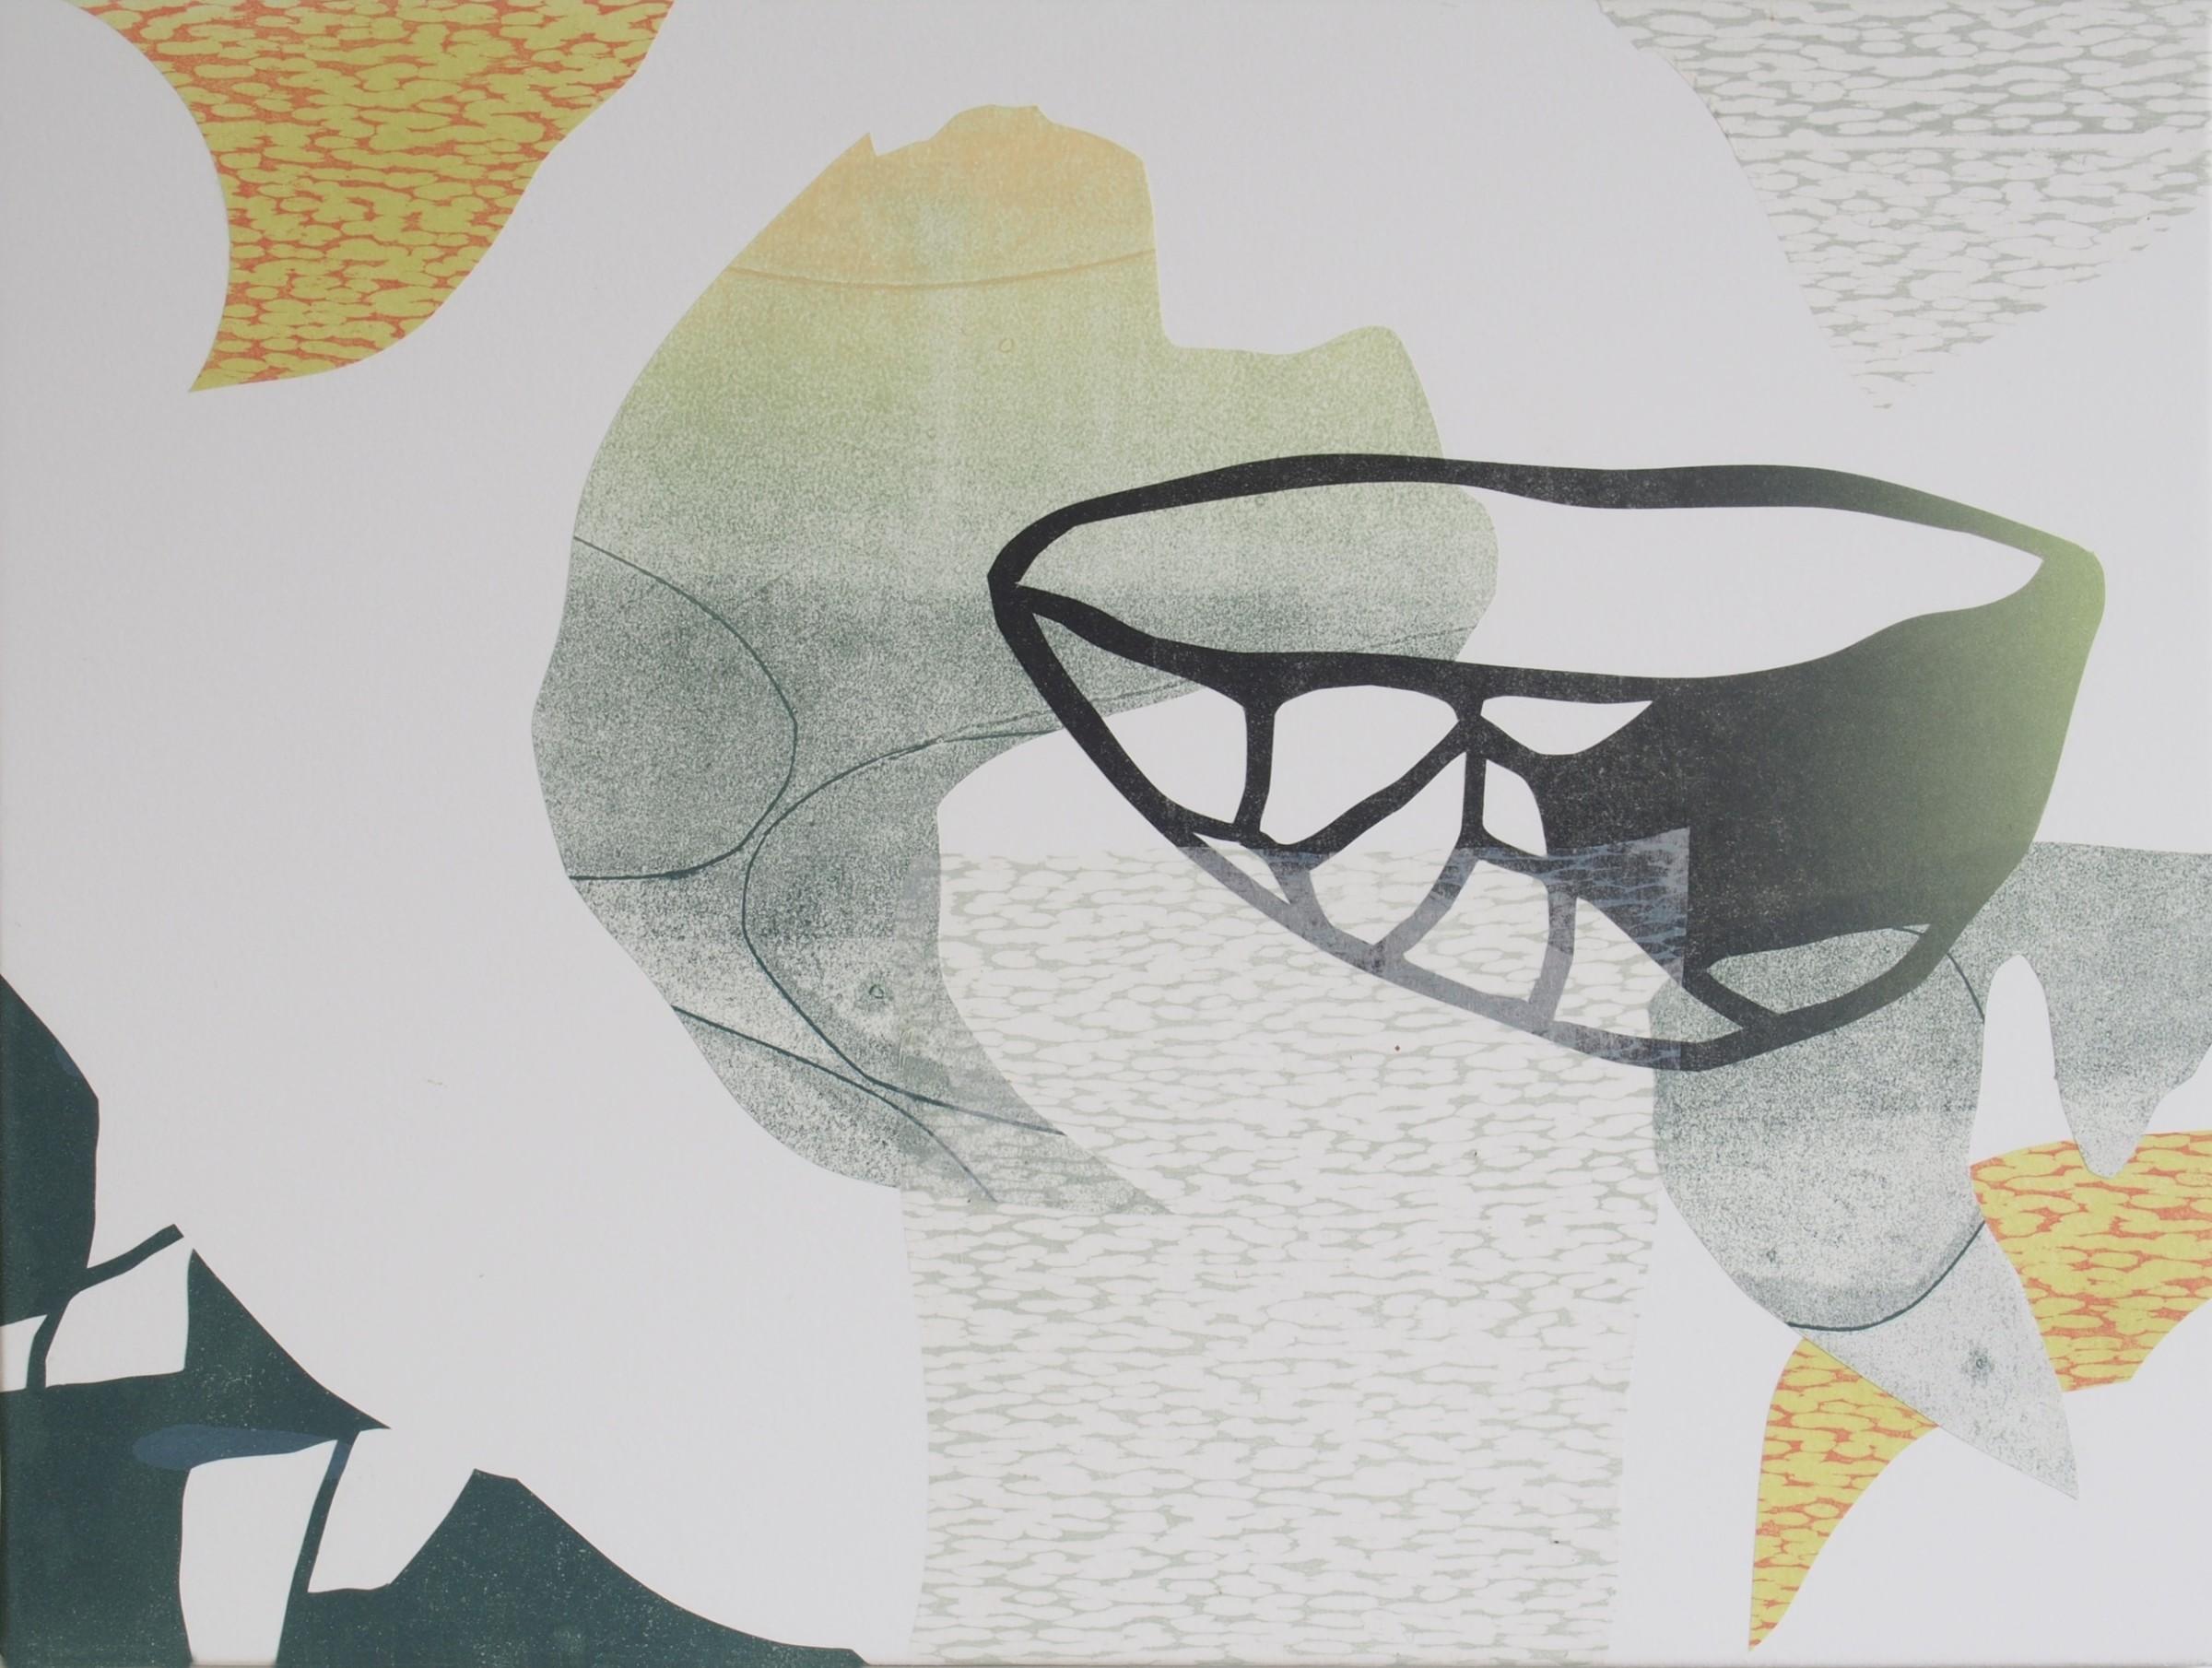 "<span class=""link fancybox-details-link""><a href=""/exhibitions/17/works/image_standalone689/"">View Detail Page</a></span><p><strong>Misa Gott</strong></p><p>Mizu Nurumu</p><p>monotype & block prints collaged onto wooden panel, 1/1</p><p>30 x 41cm</p><p>£250 framed</p>"